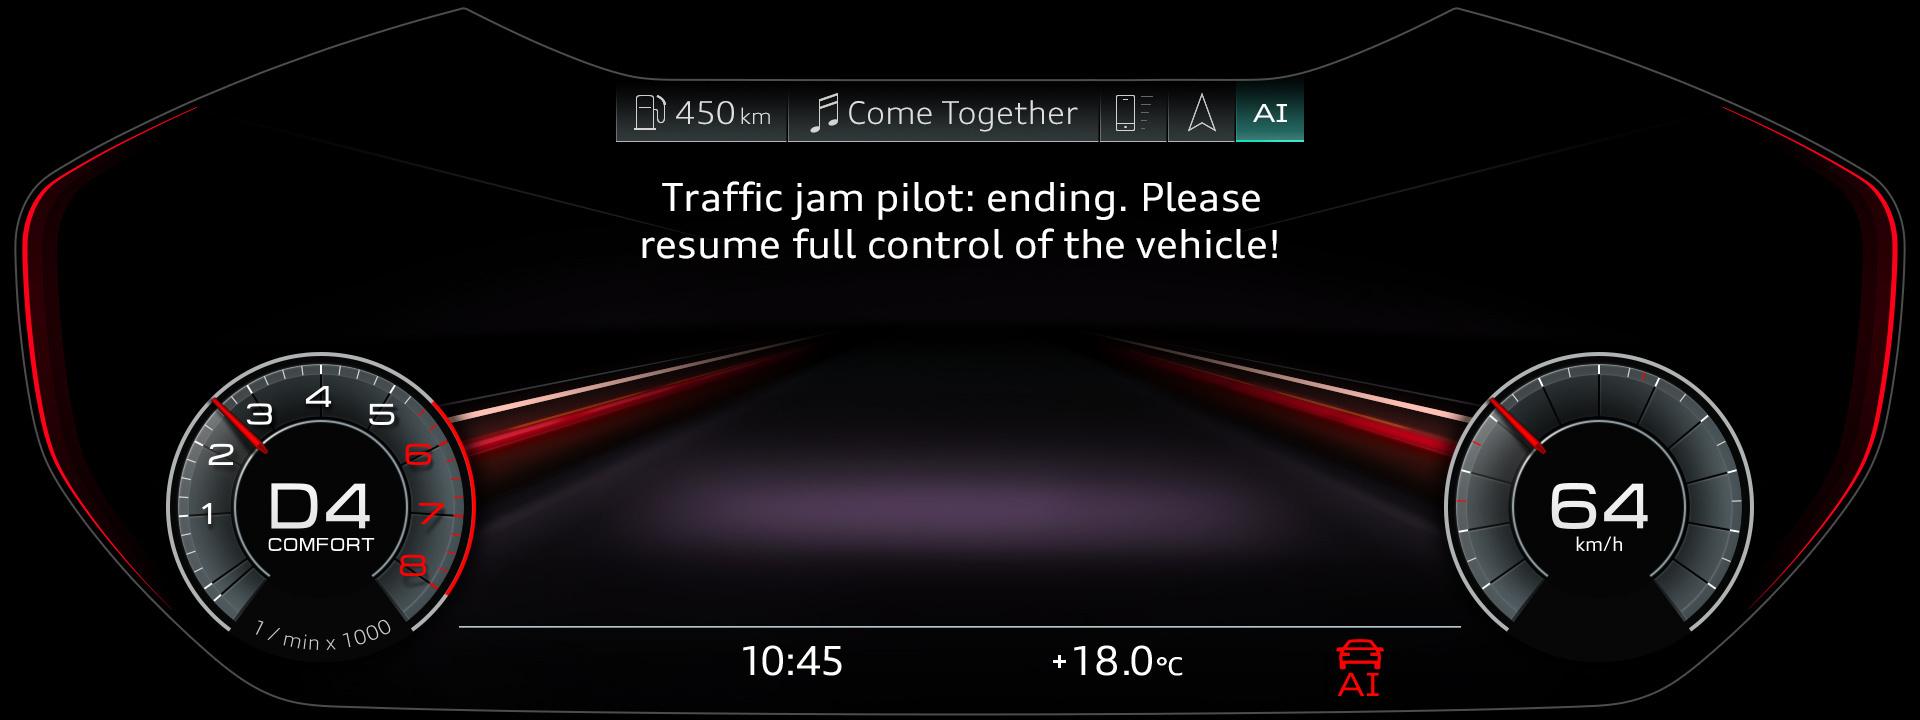 автопилотирование в условиях пробок Audi A8